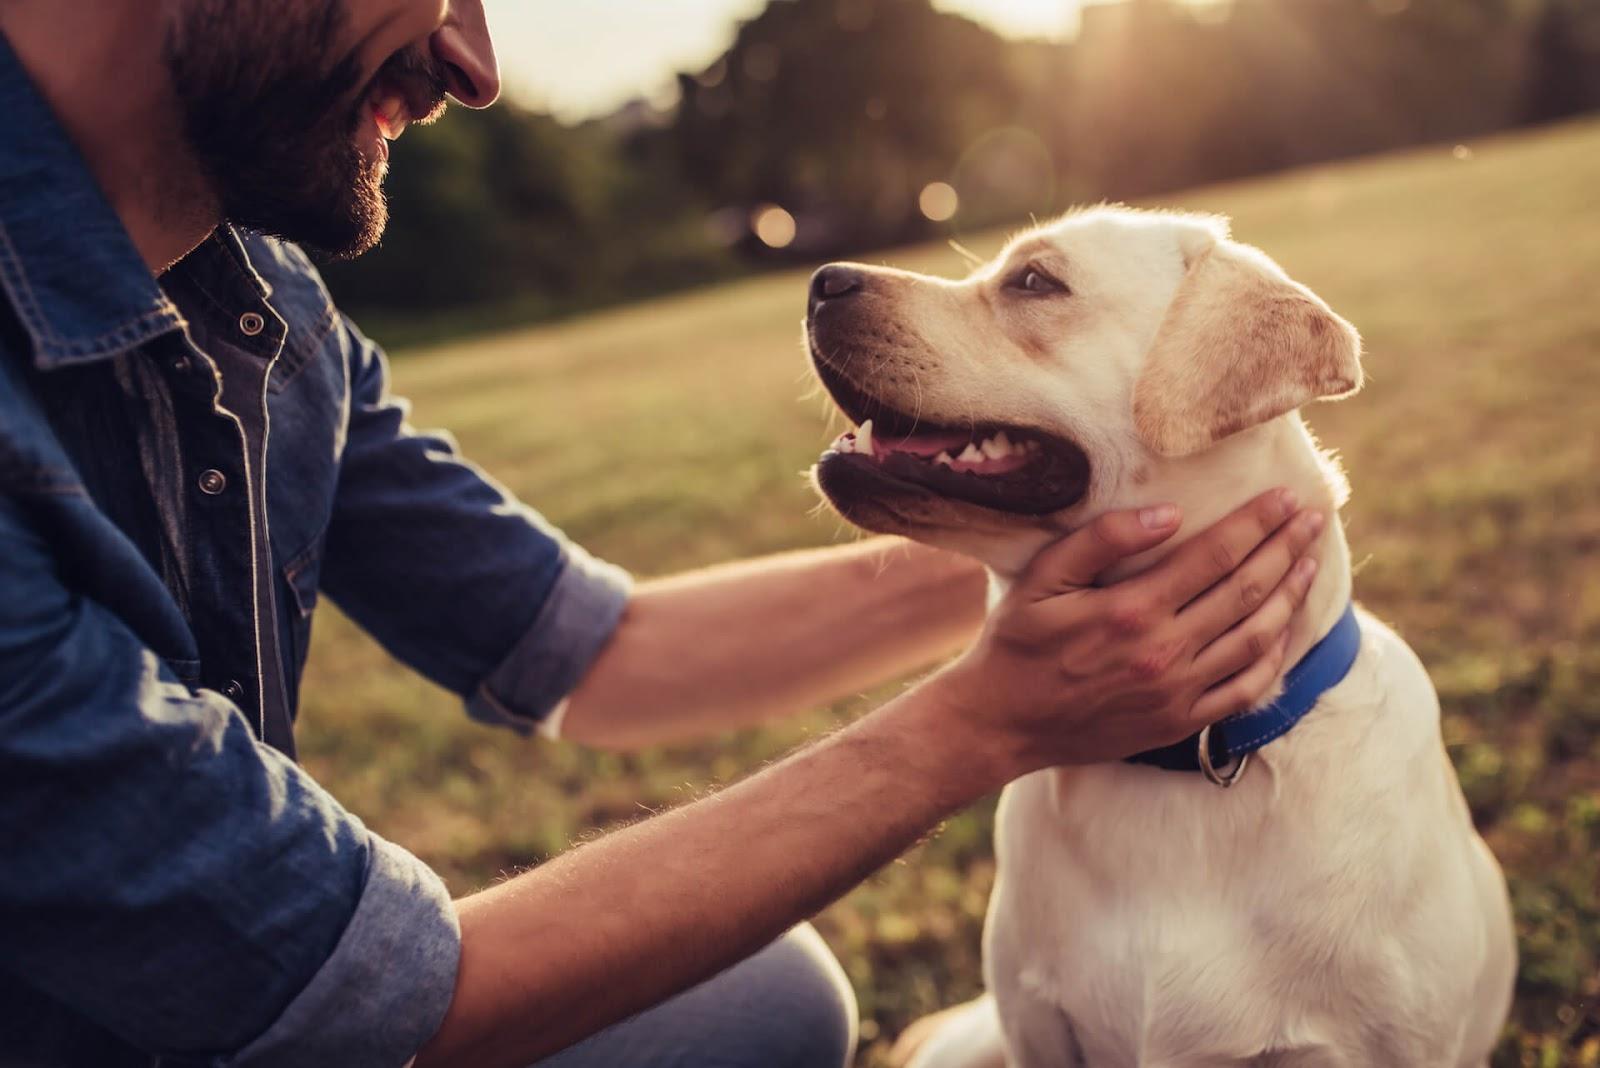 Man petting a dog in a field